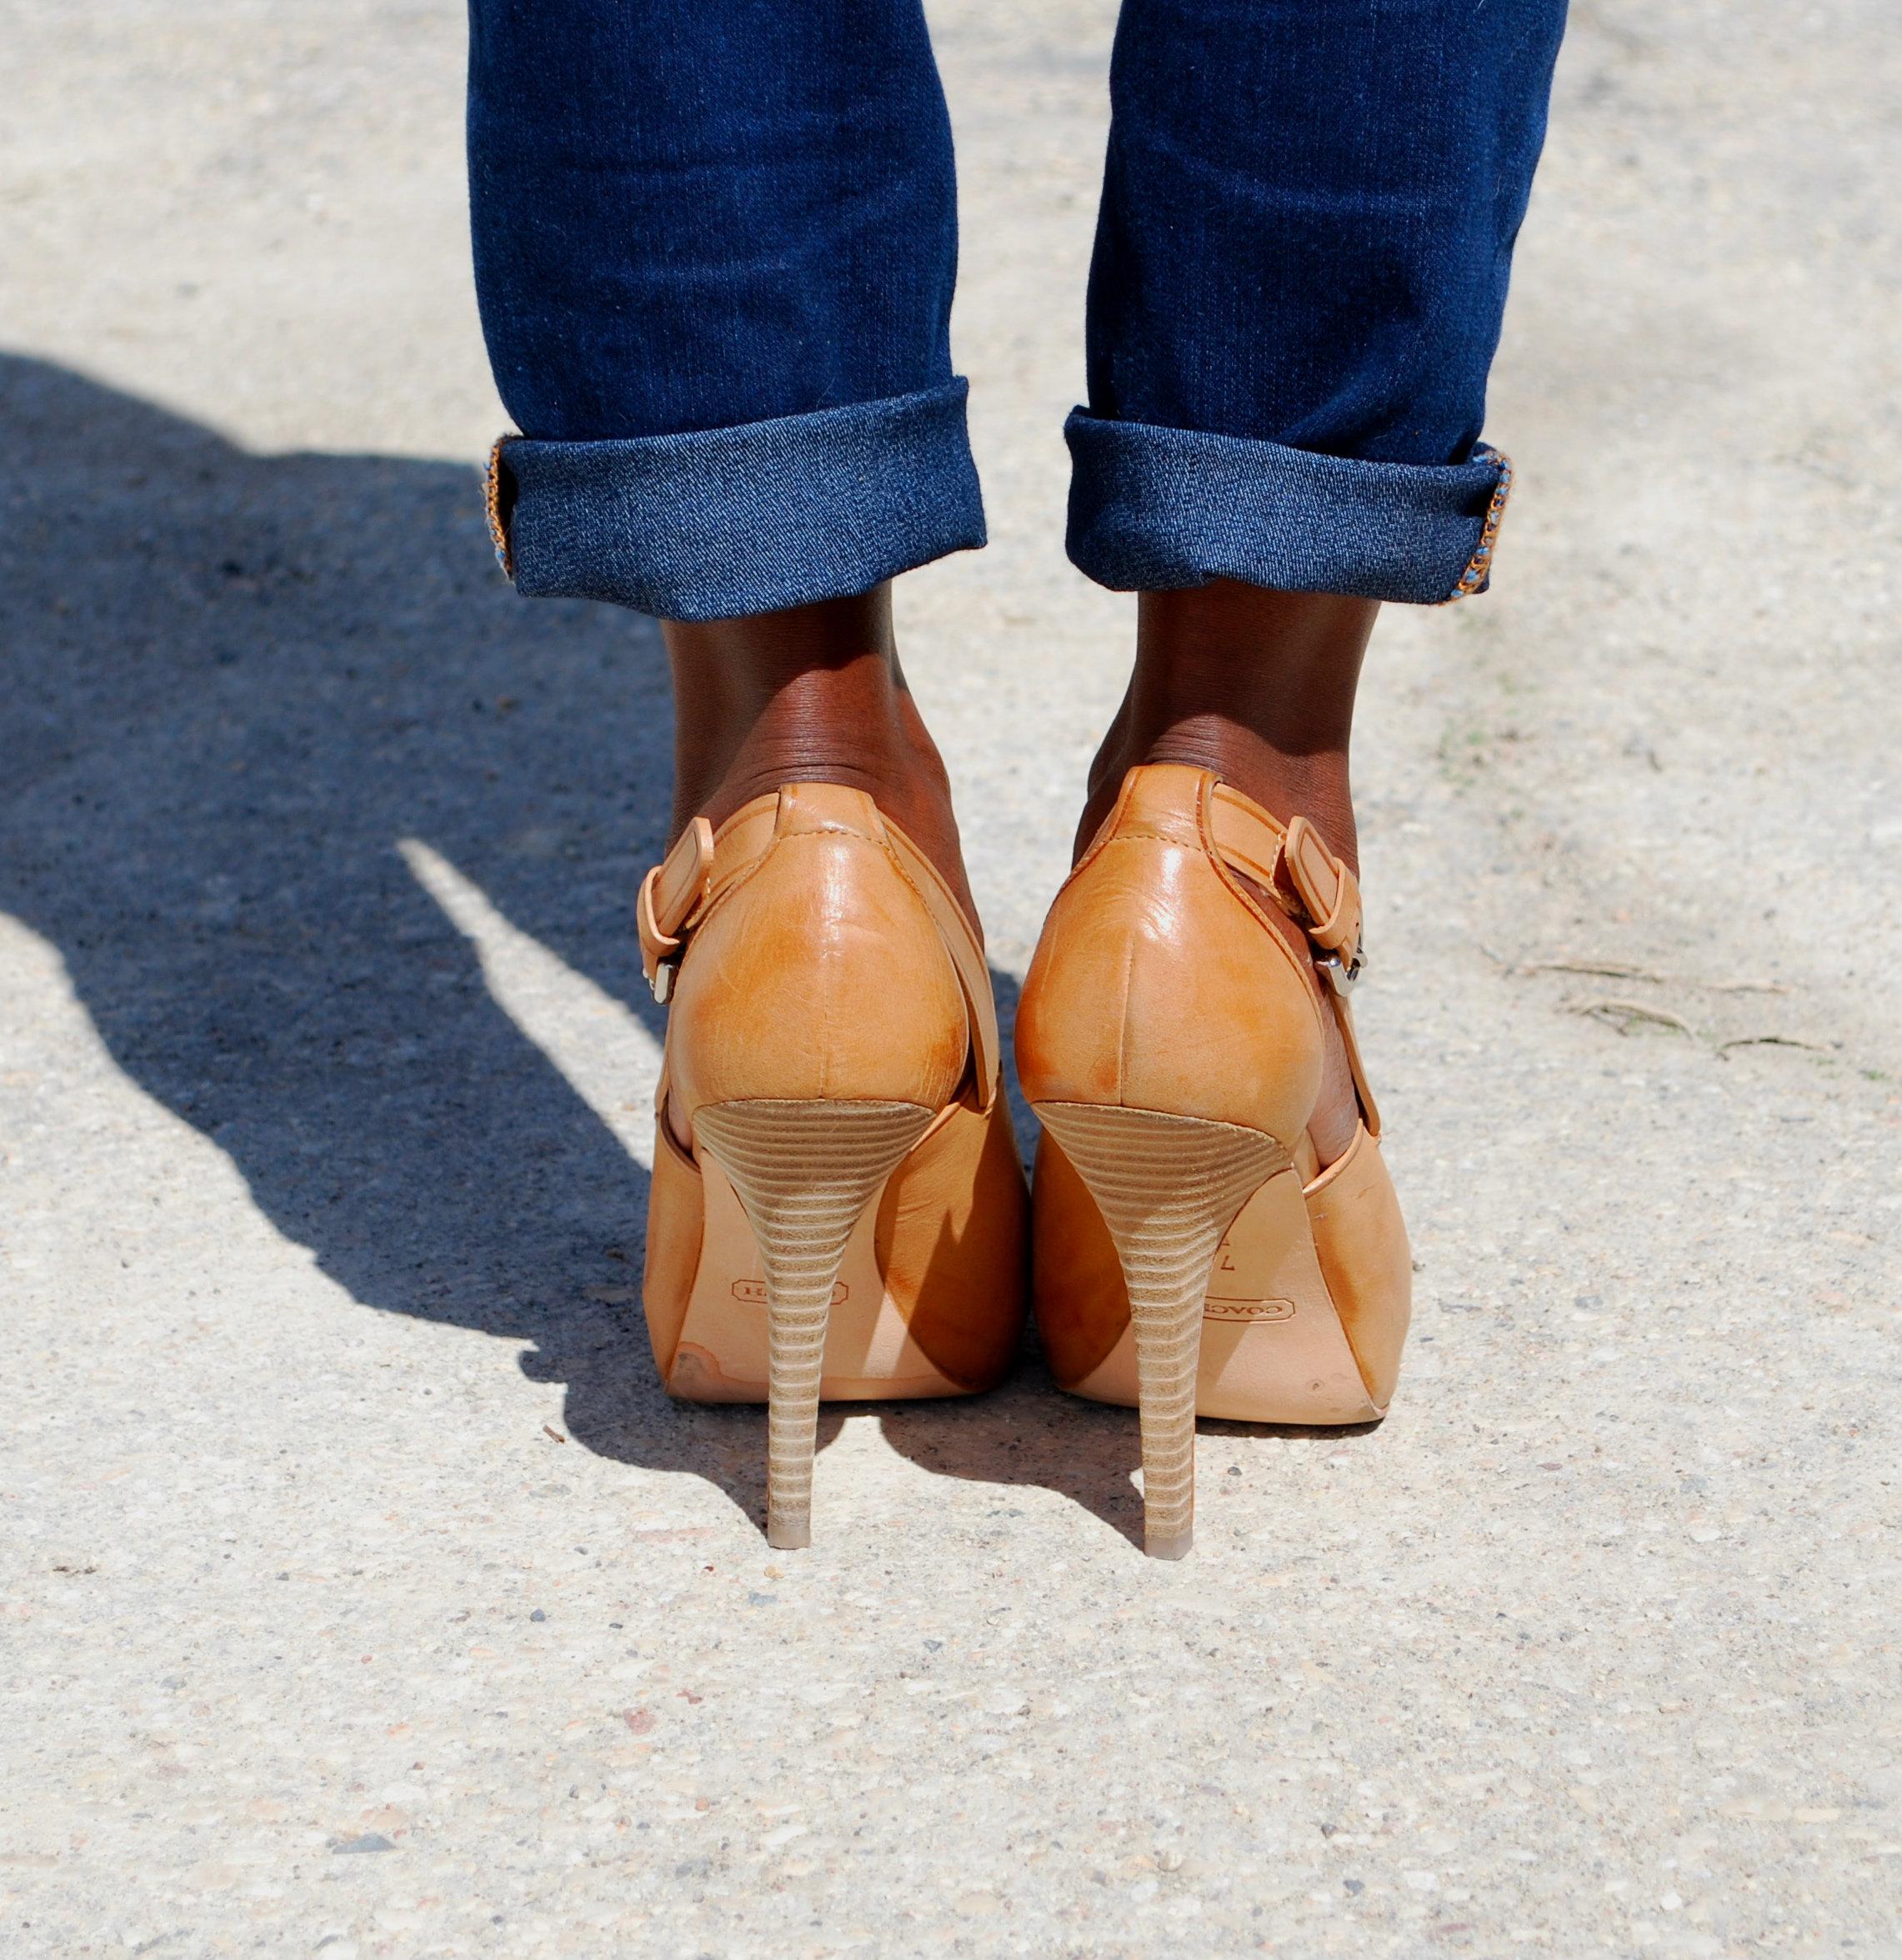 ootd shoe shot